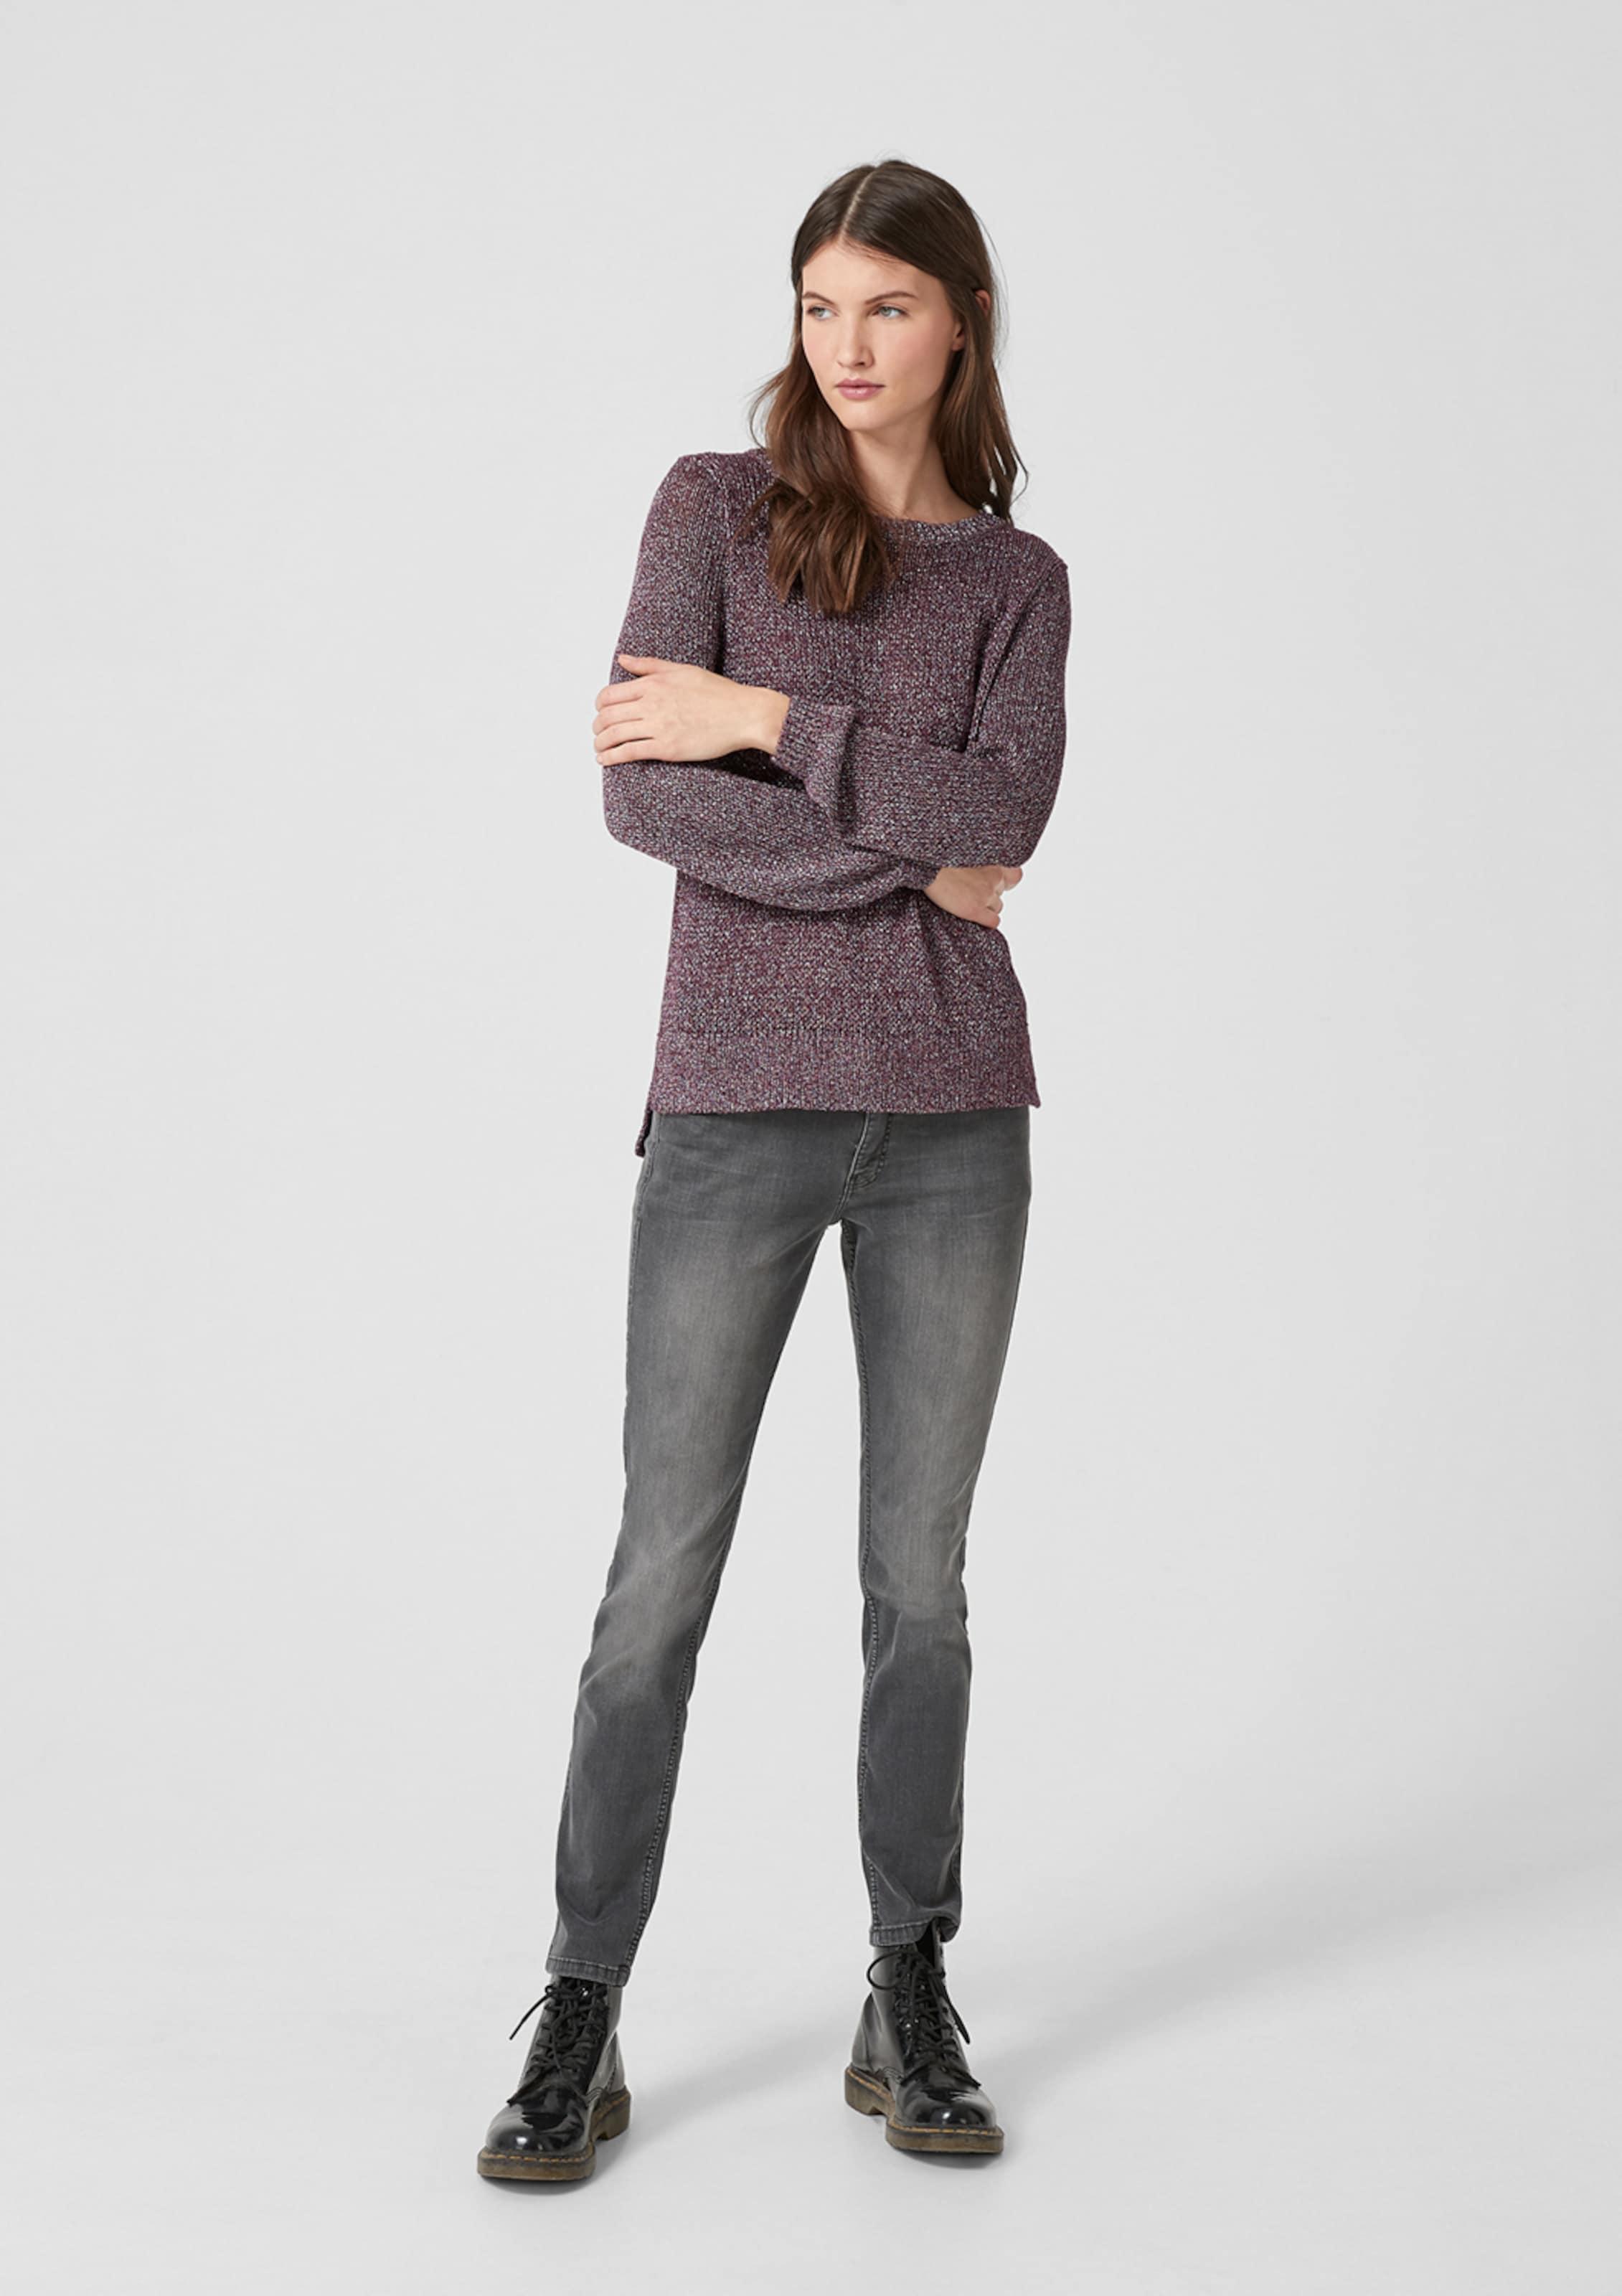 Rotviolett Designed In s By Q Pullover ZikPXOu